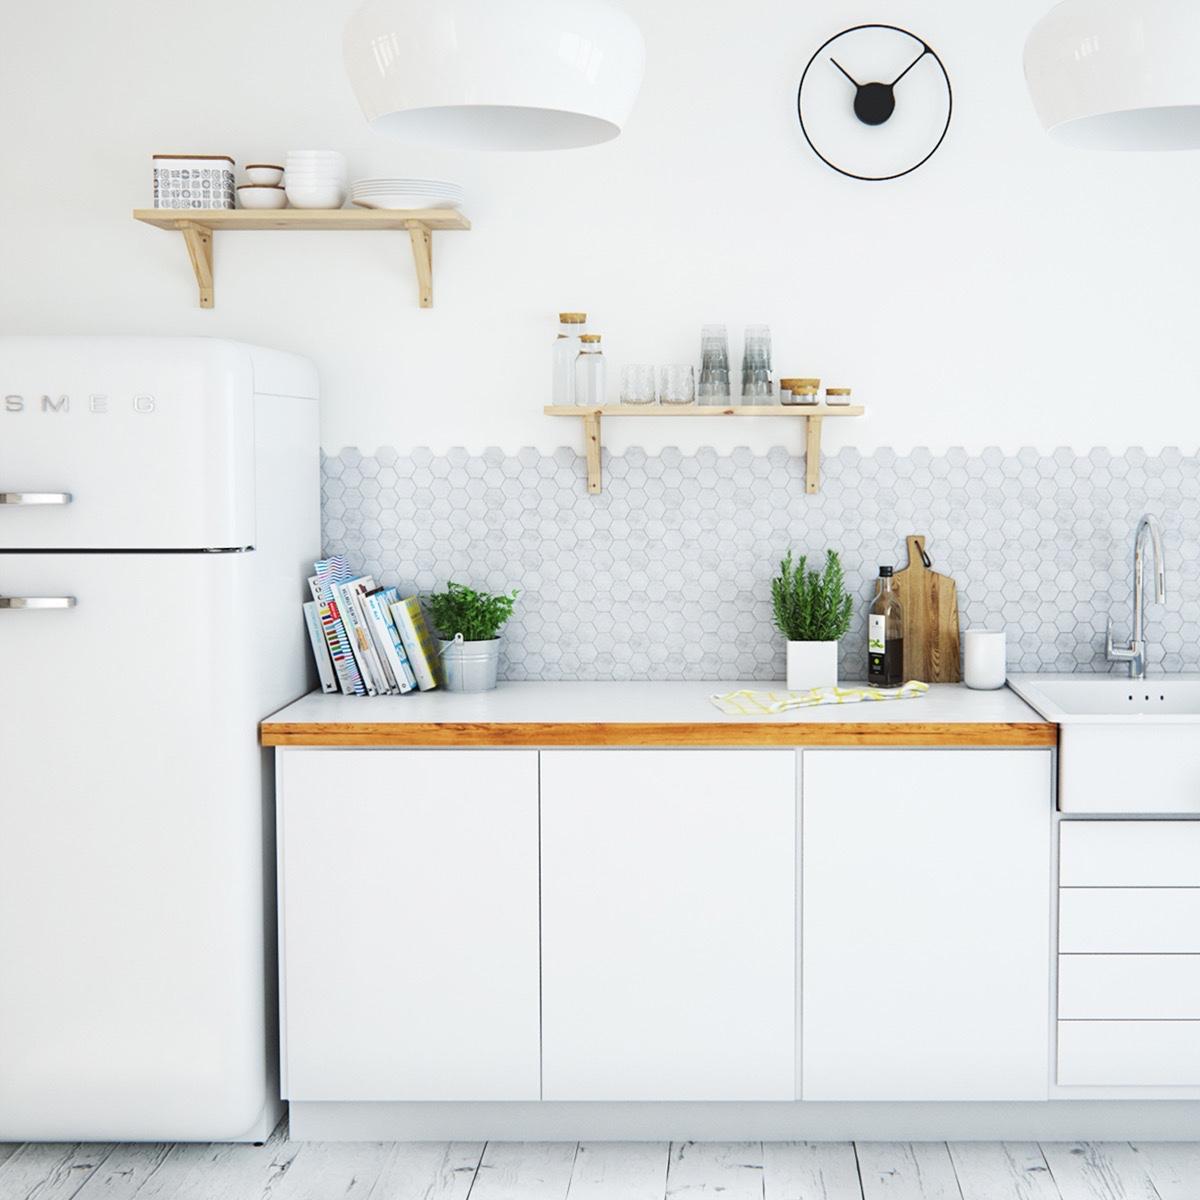 10-cozinha-estilo-escandinavo